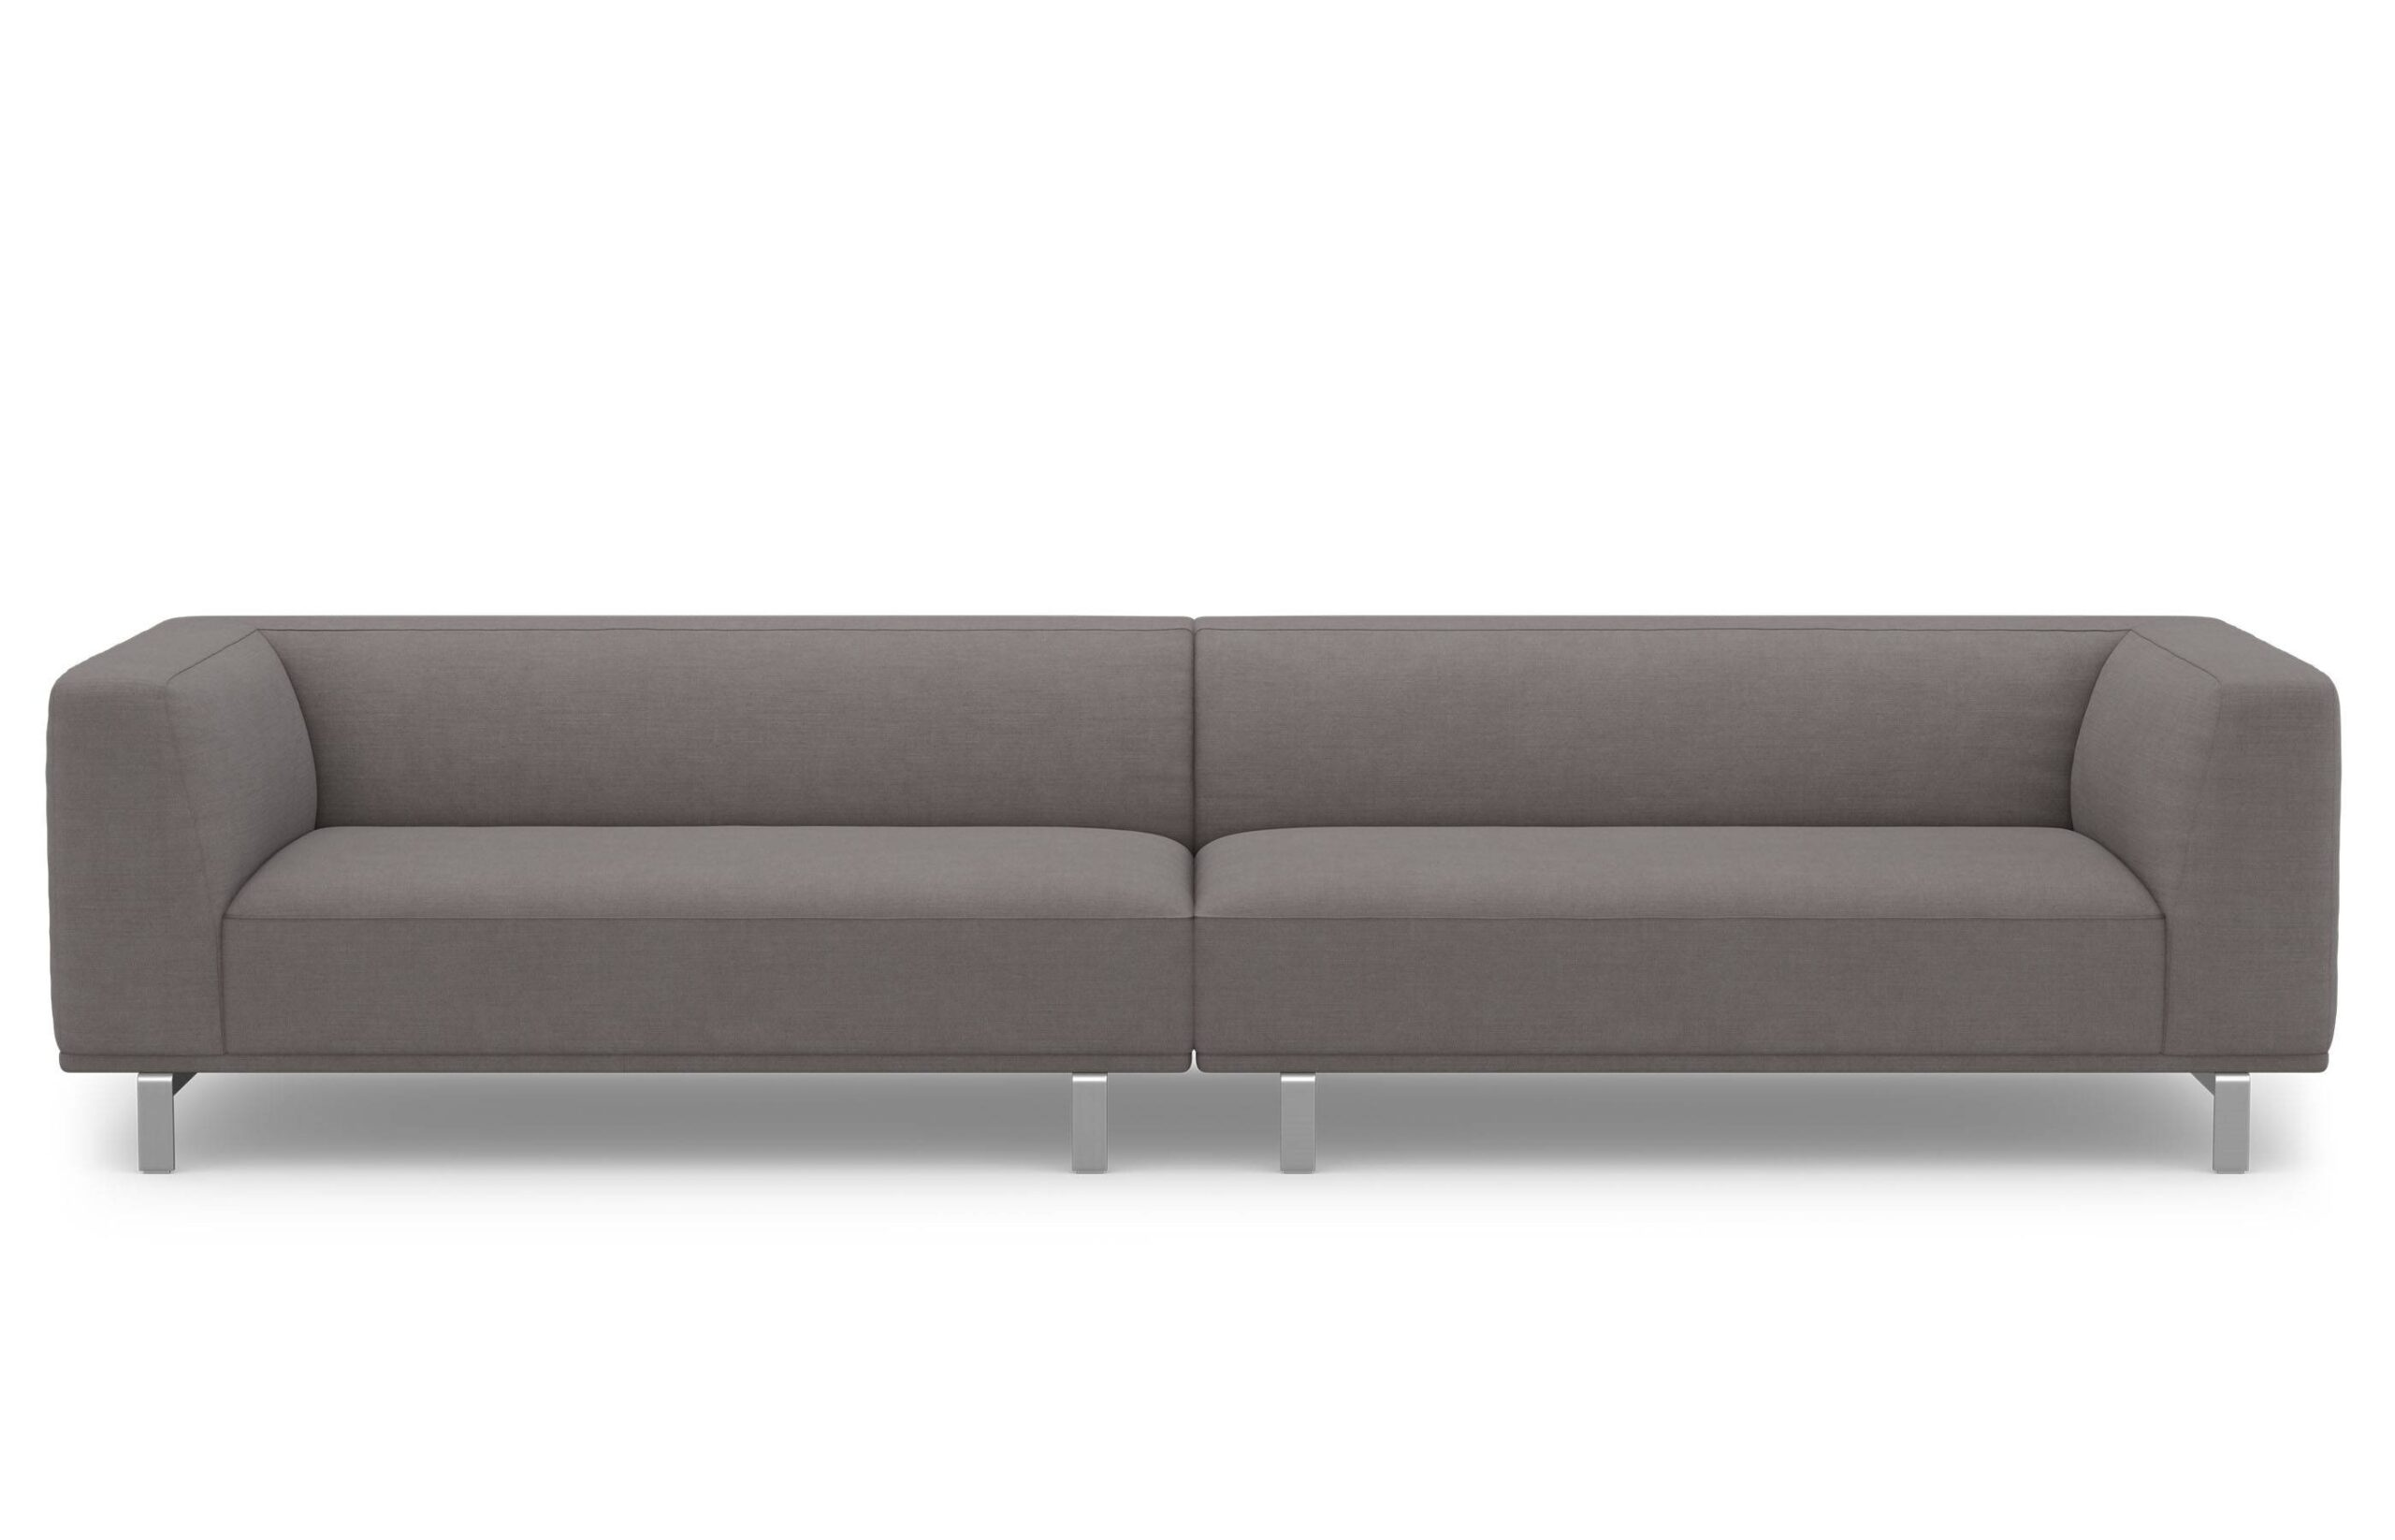 Full Size of Sofa Stoff Grau Chesterfield Grauer Reinigen Schlaffunktion 3er Gebraucht Sofas Ikea Graues Grober Kaufen Big Couch 4 Sitzer View Sitzfeldtcom Hannover Sofa Sofa Stoff Grau